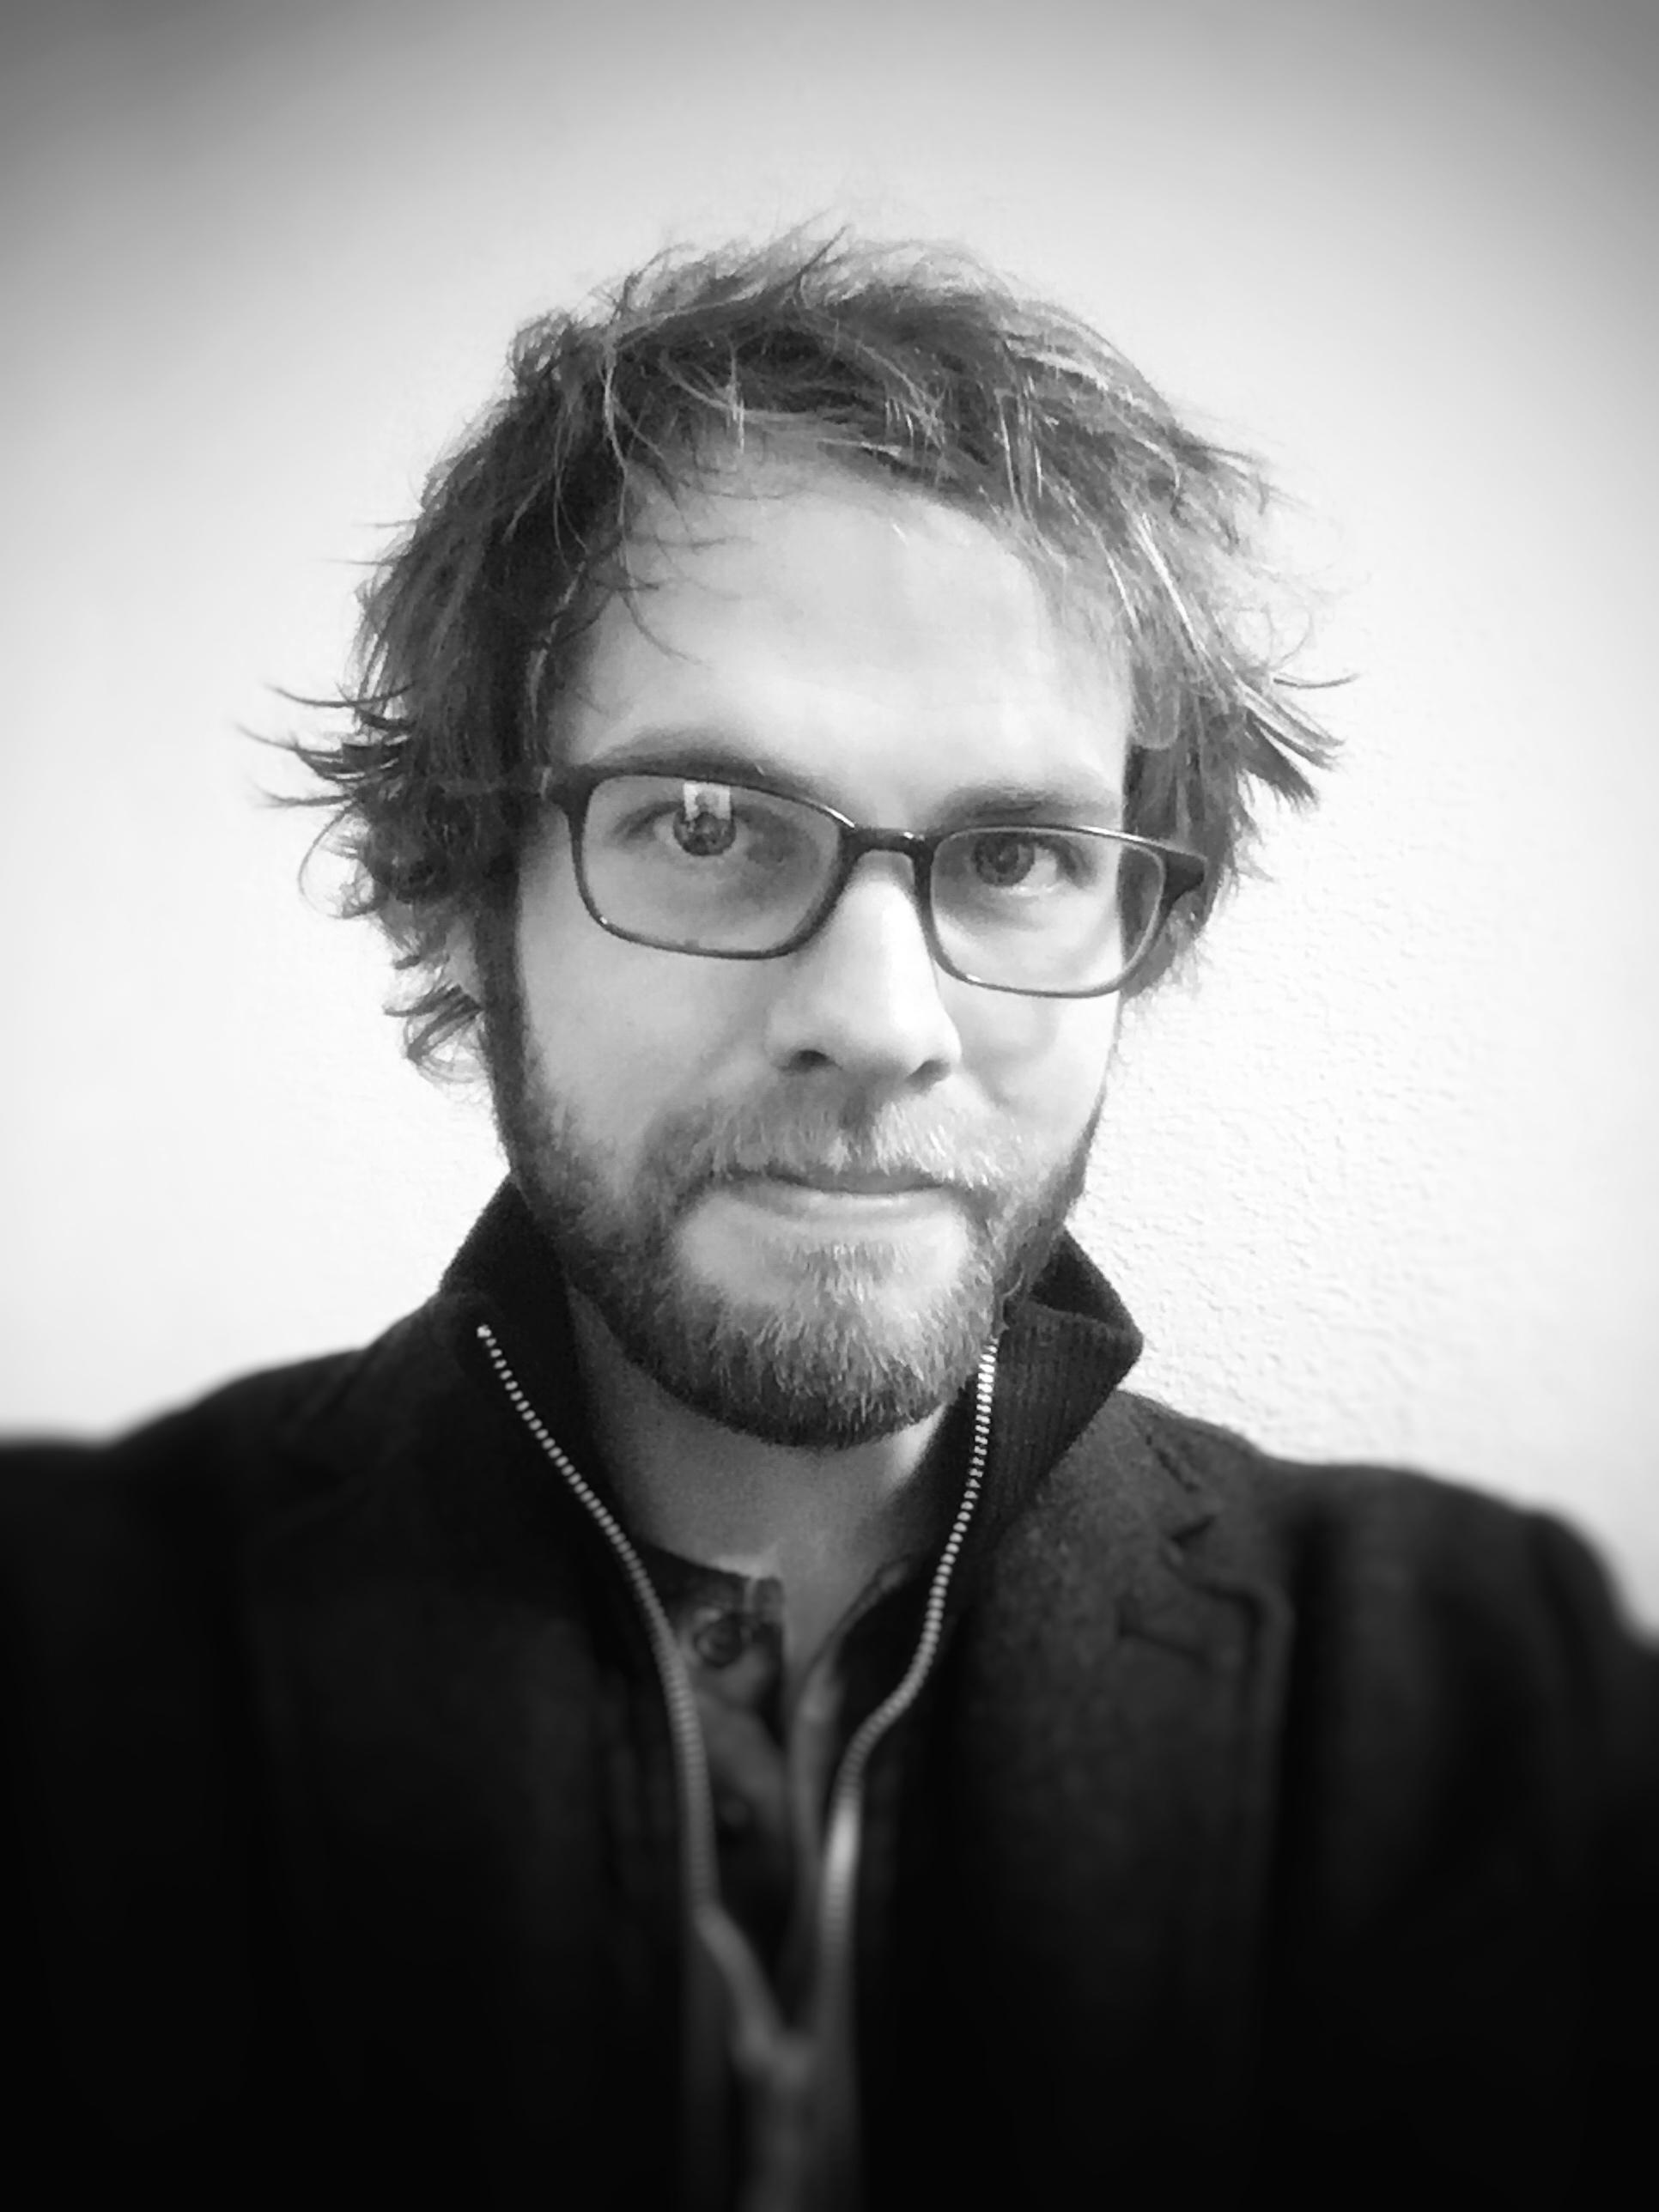 NicolasLee_Noggin.JPG